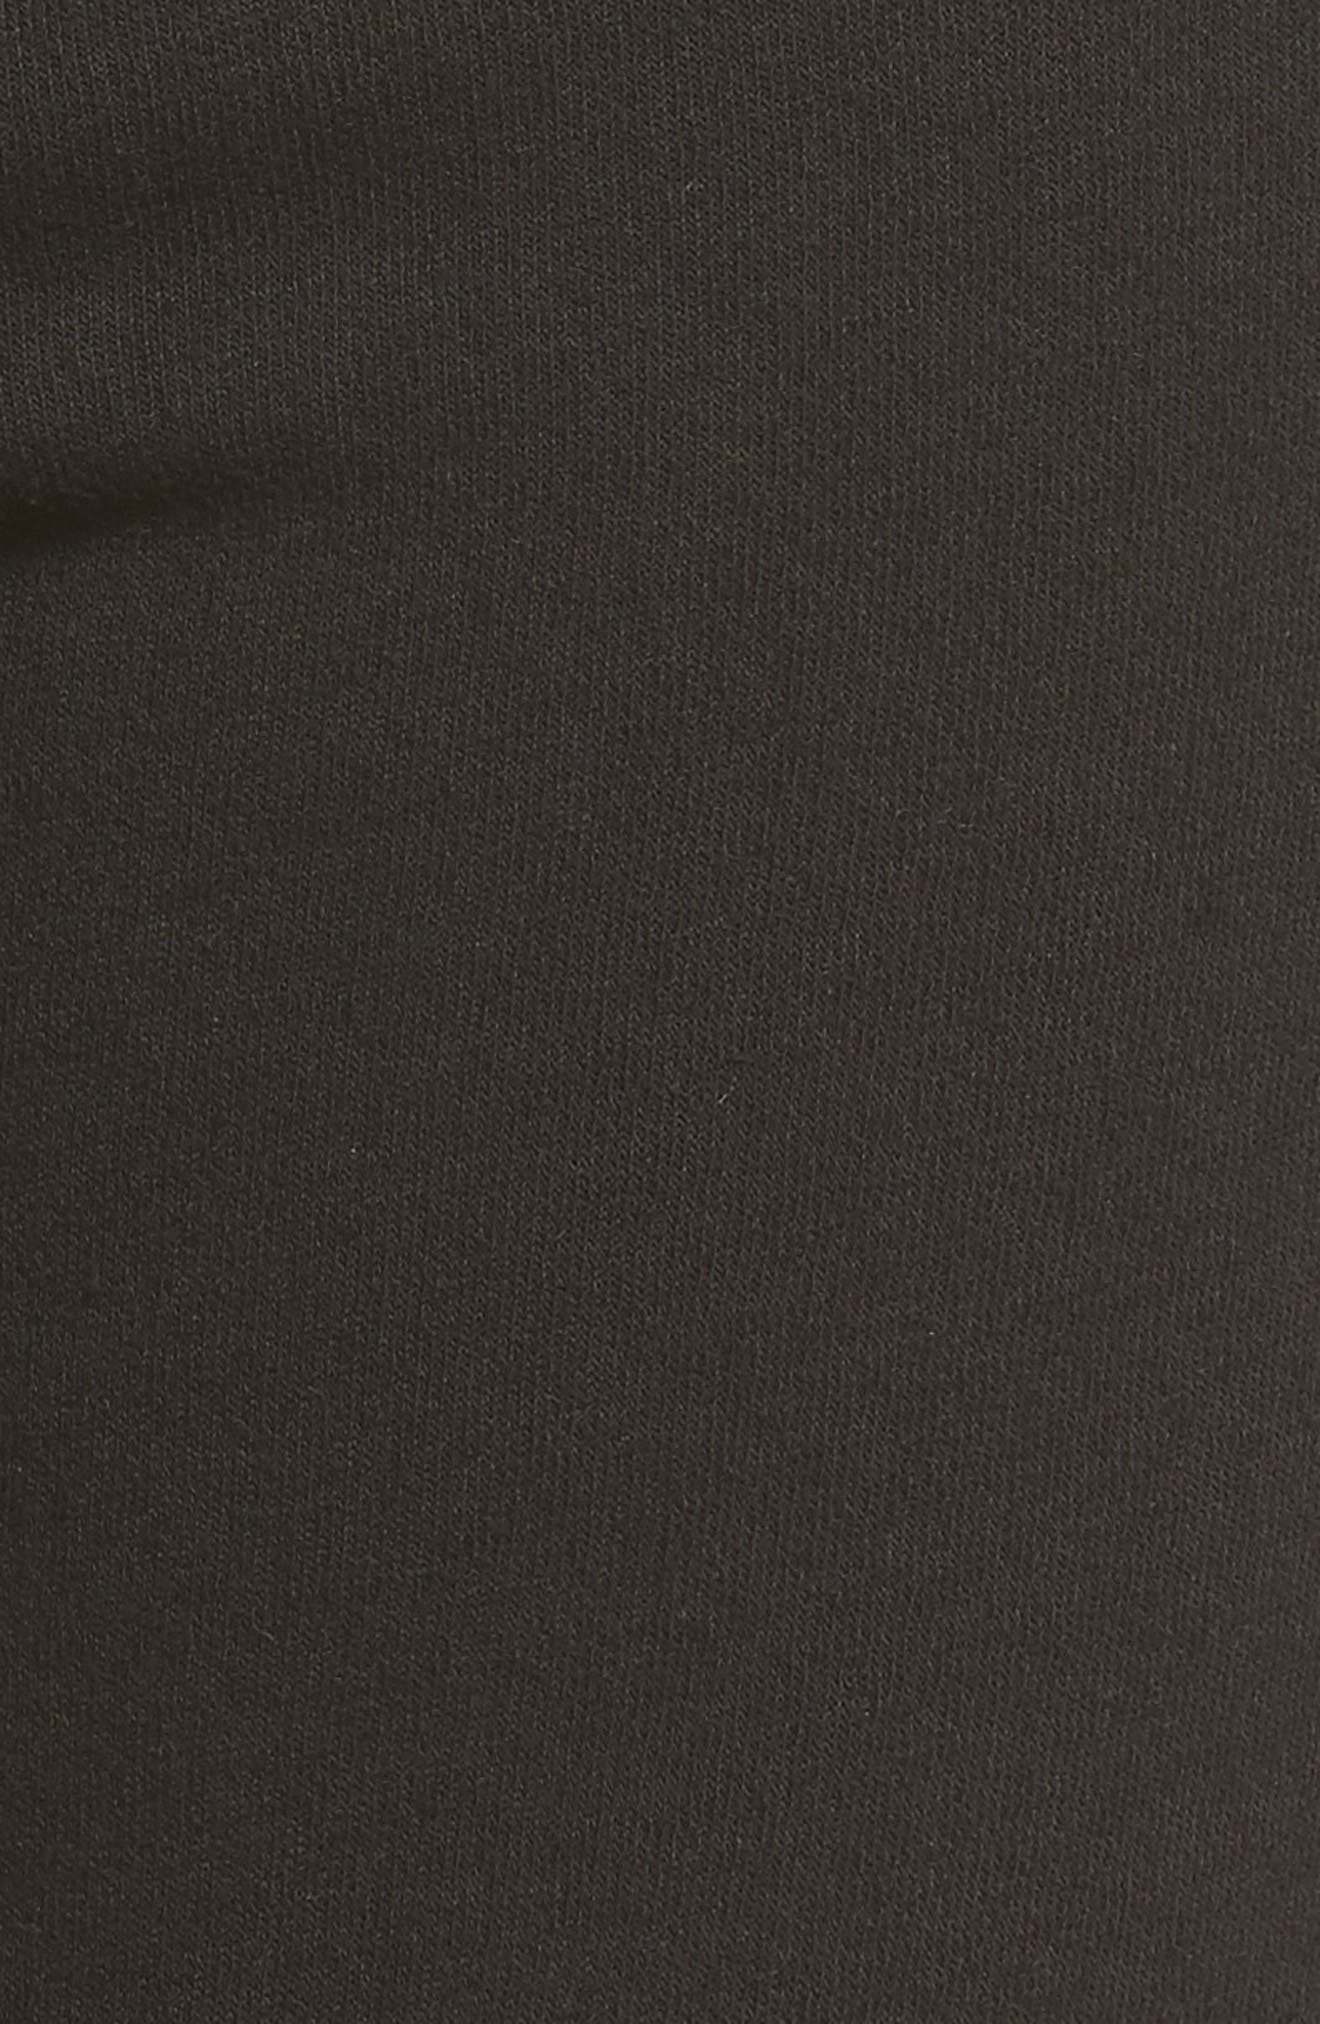 Betsee Distressed Jogger Pants,                             Alternate thumbnail 5, color,                             Black